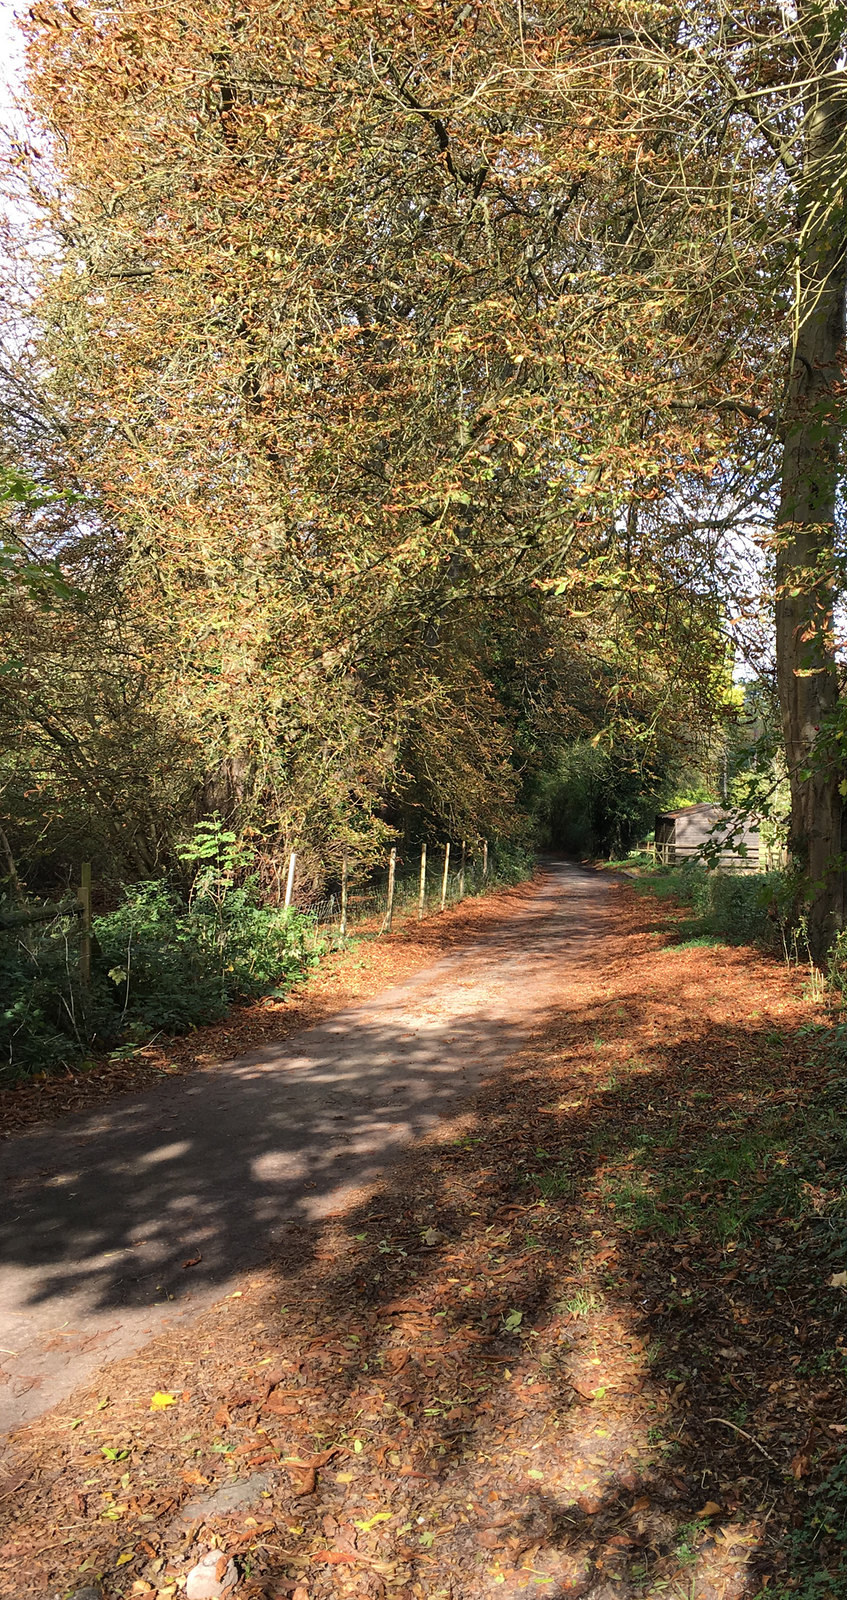 2017-10-08 12.51.15 Woldingham Circular